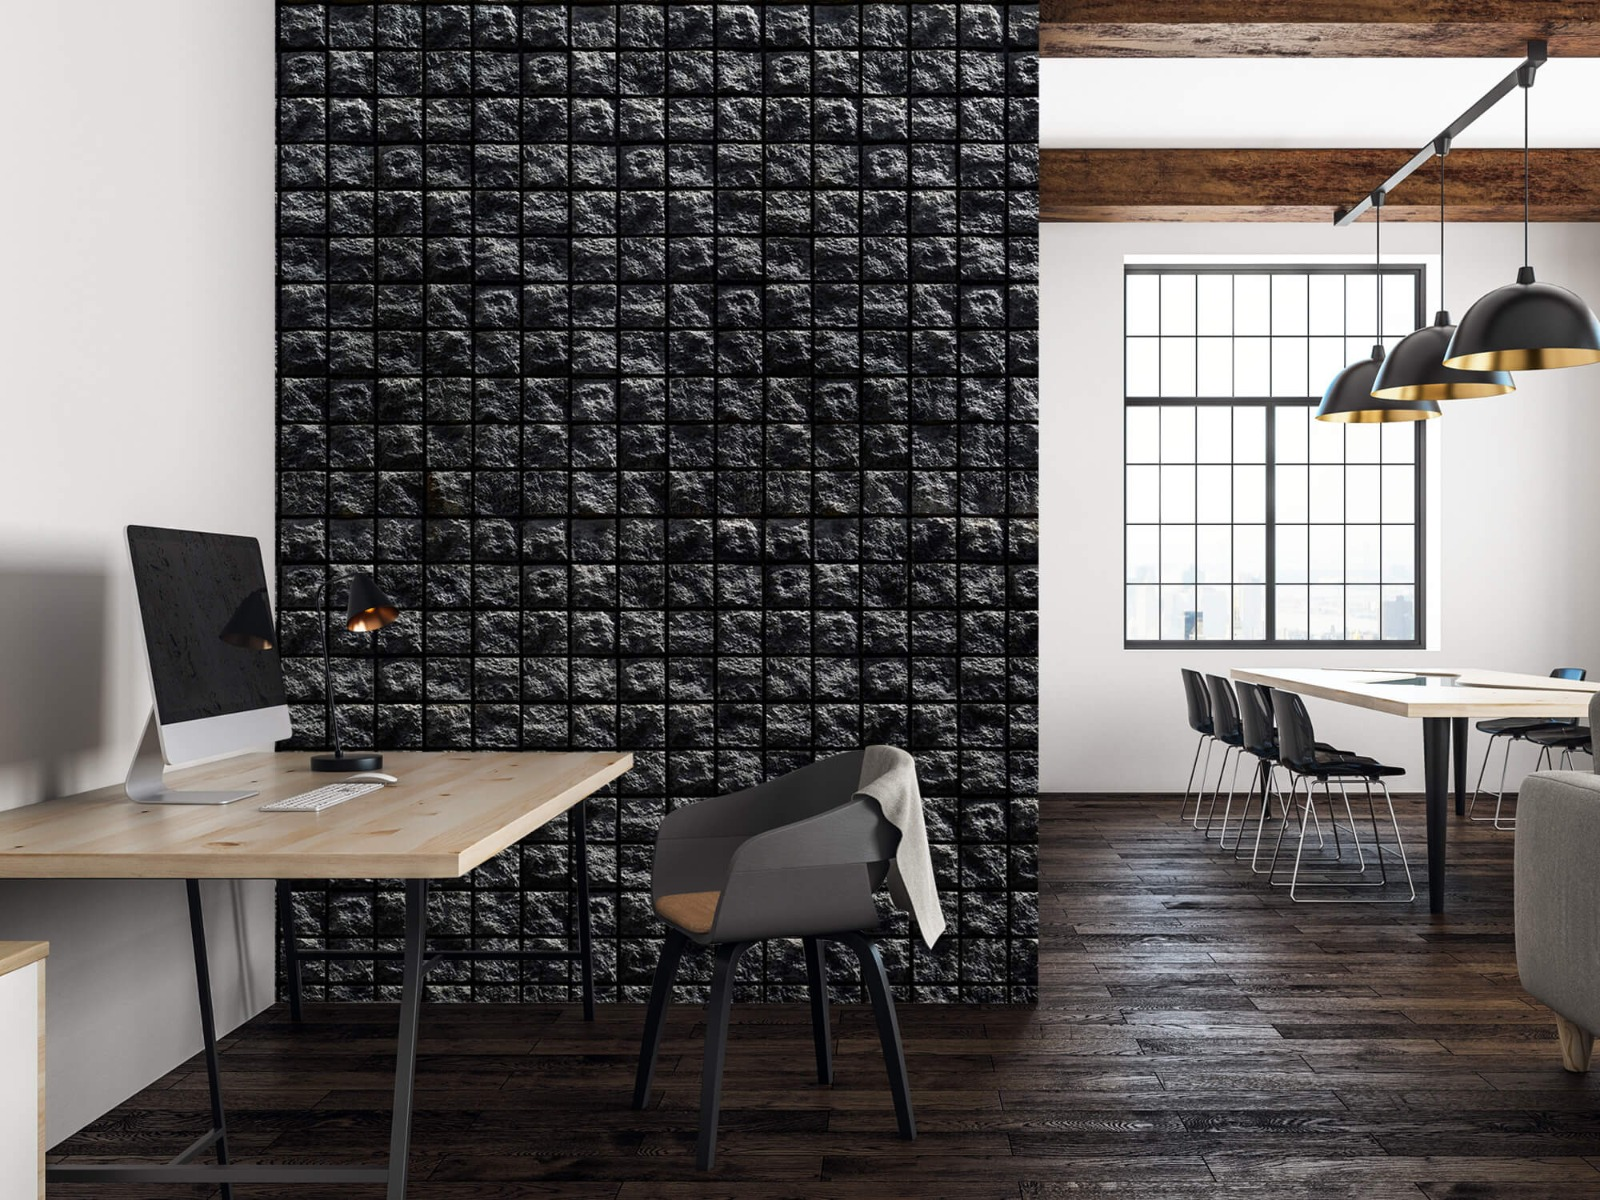 Tegel behang - Vierkante zwarte stenen - Wallexclusive - Woonkamer 22